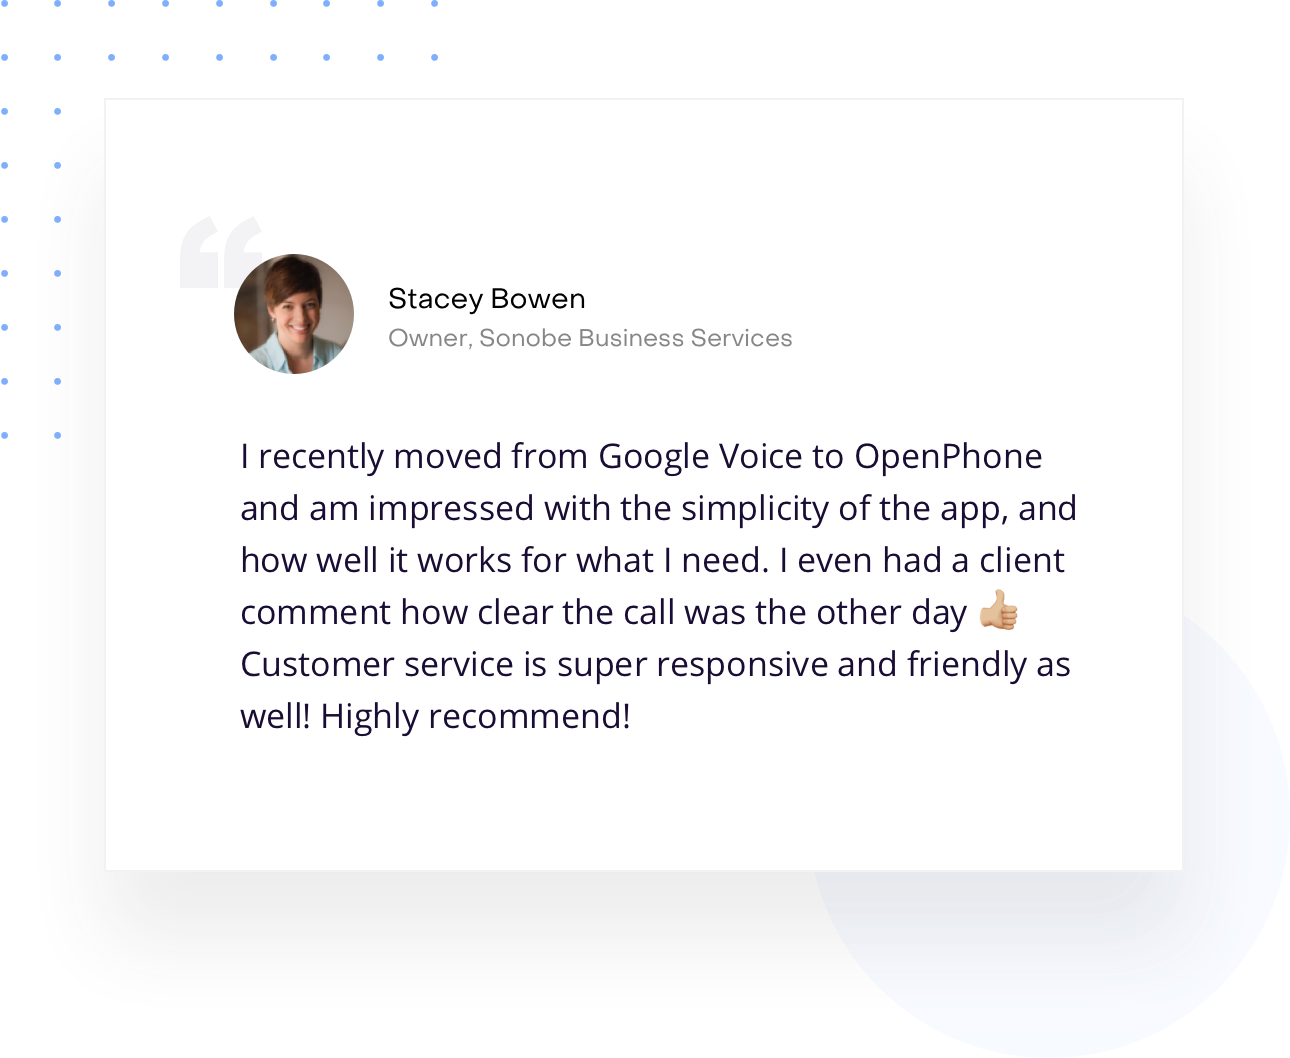 Google Voice Alternative - OpenPhone vs Google Voice